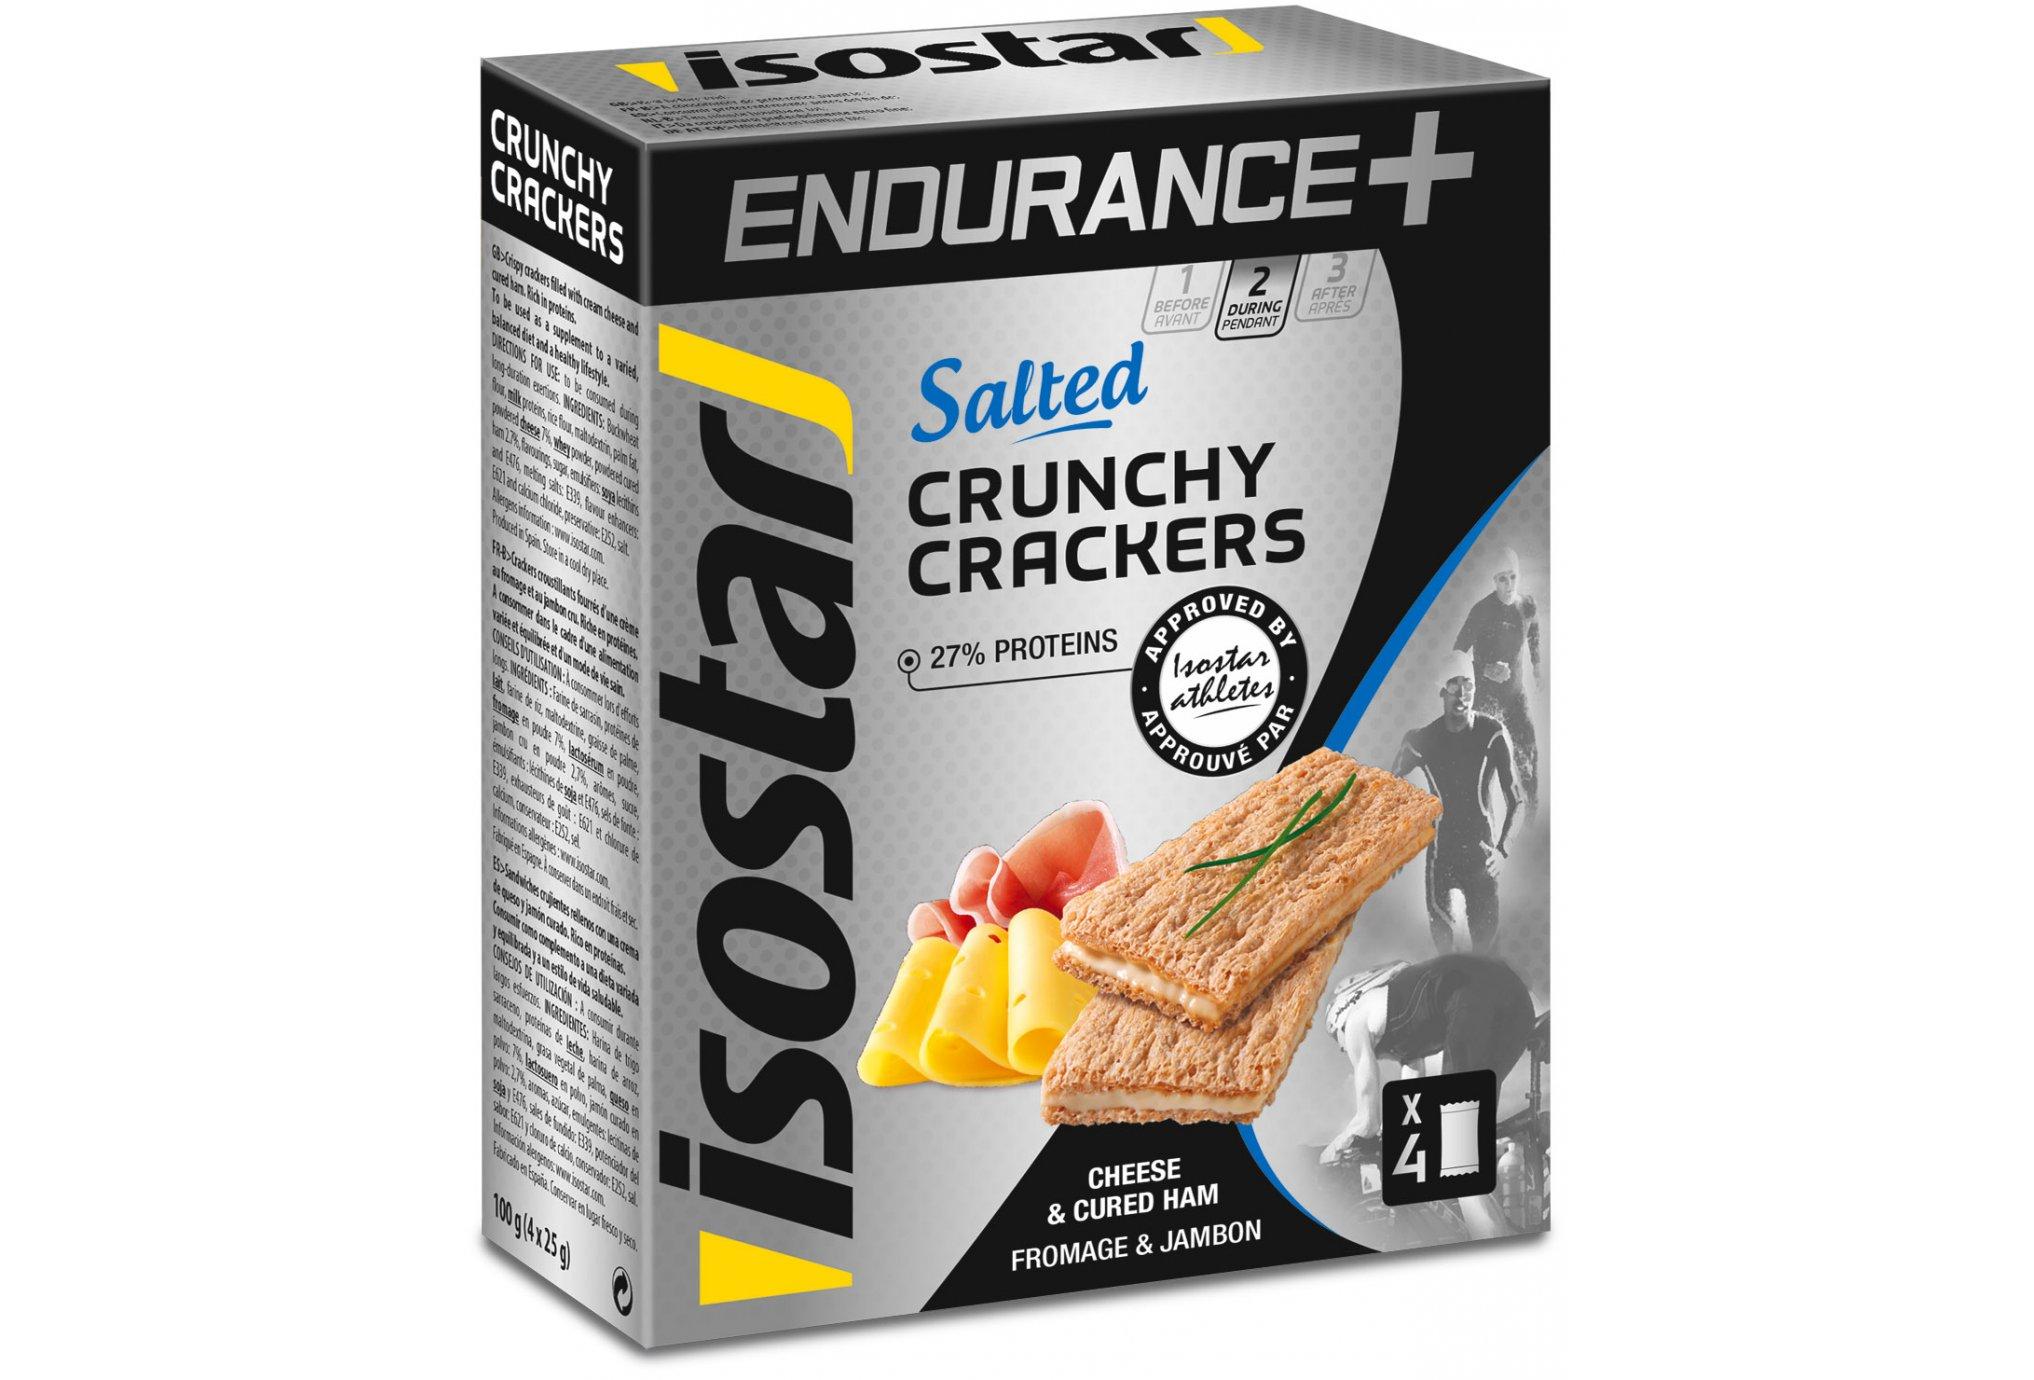 Isostar Crunchy Crackers Endurance+ - Jambon Fromage Diététique Barres